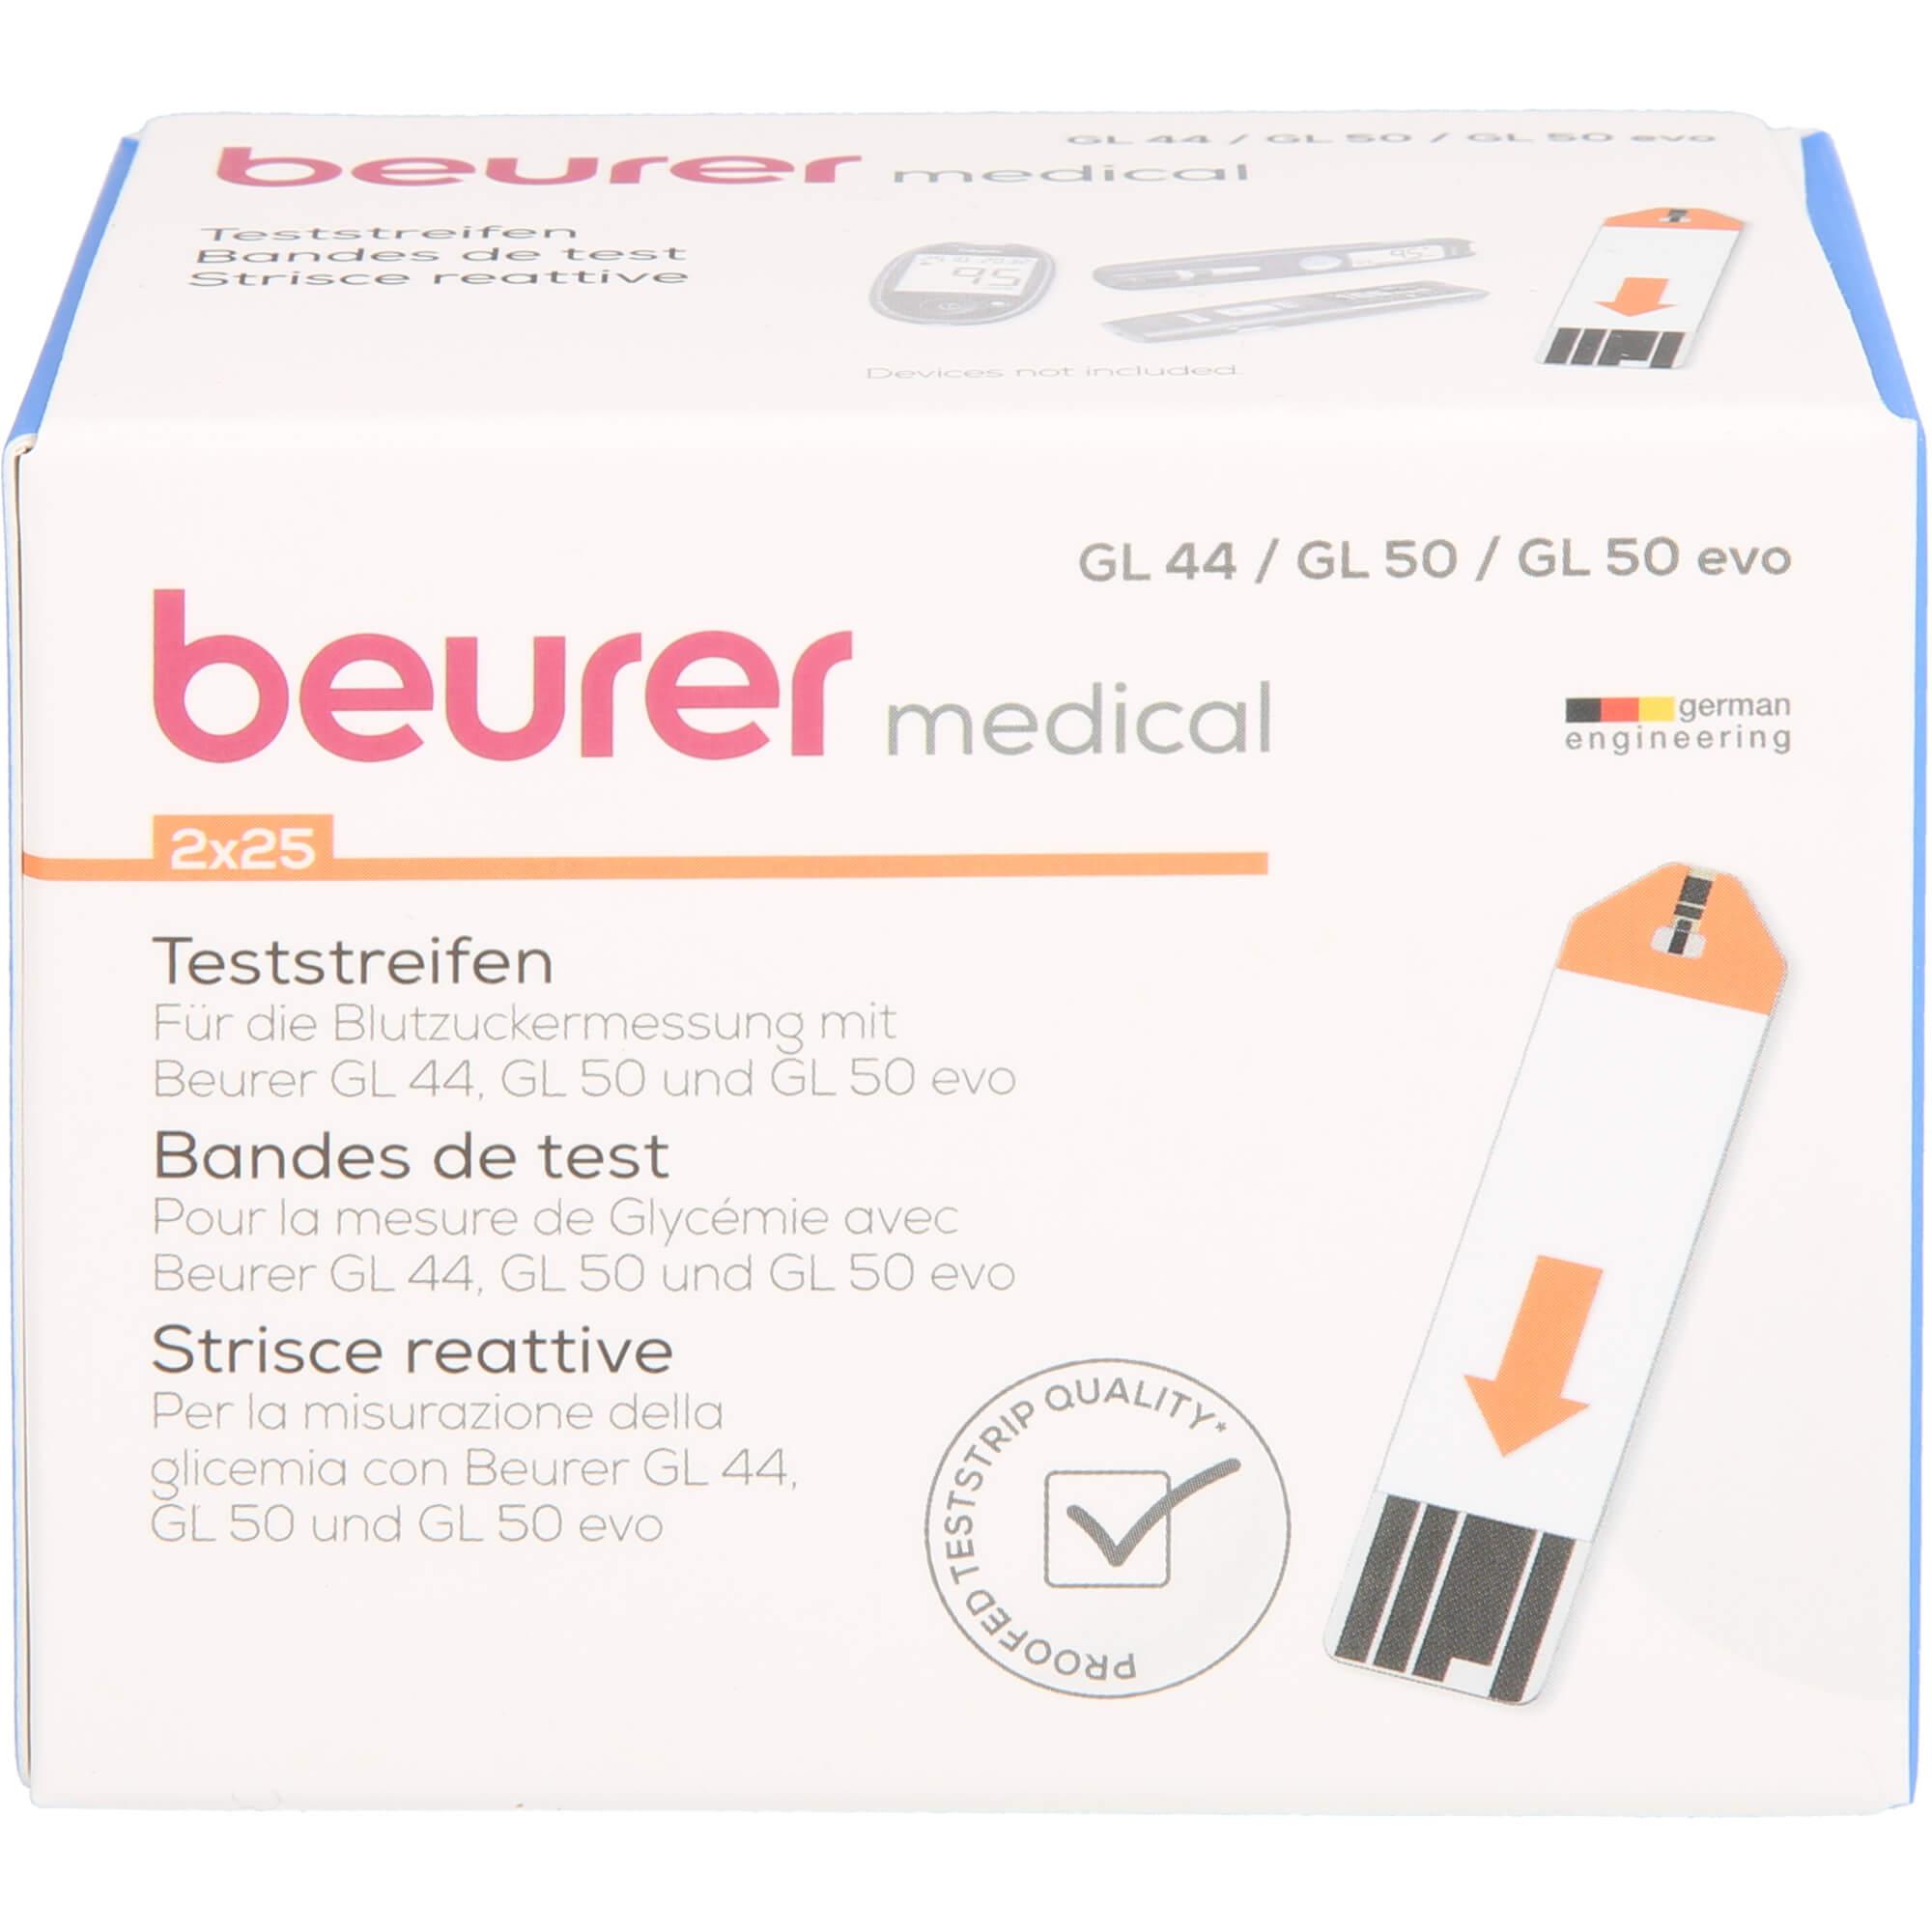 BEURER-GL44-GL50-GL50evo-Teststreifen